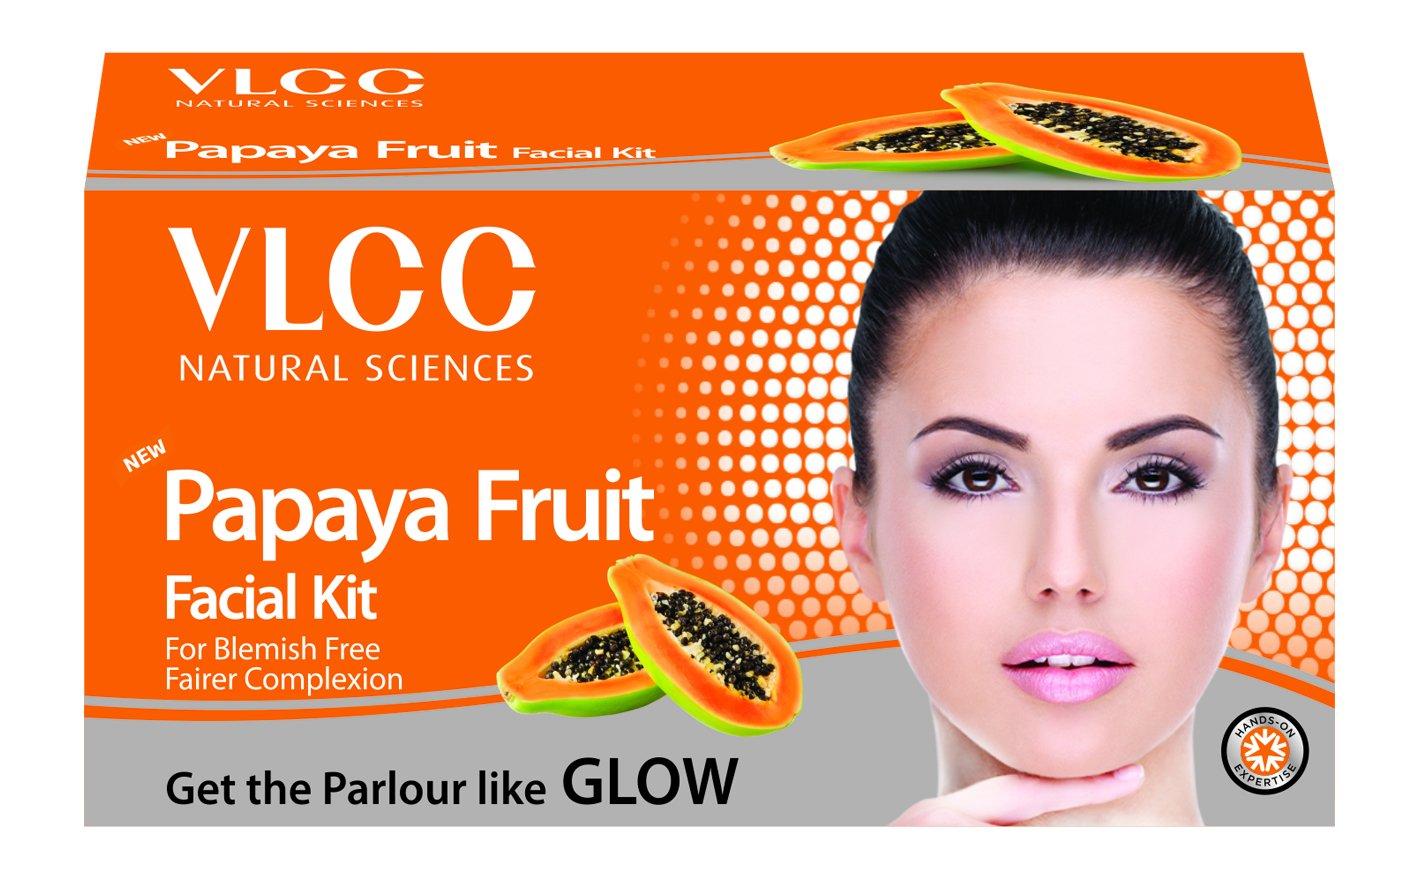 VLCC Papaya Fruit Facial Kit